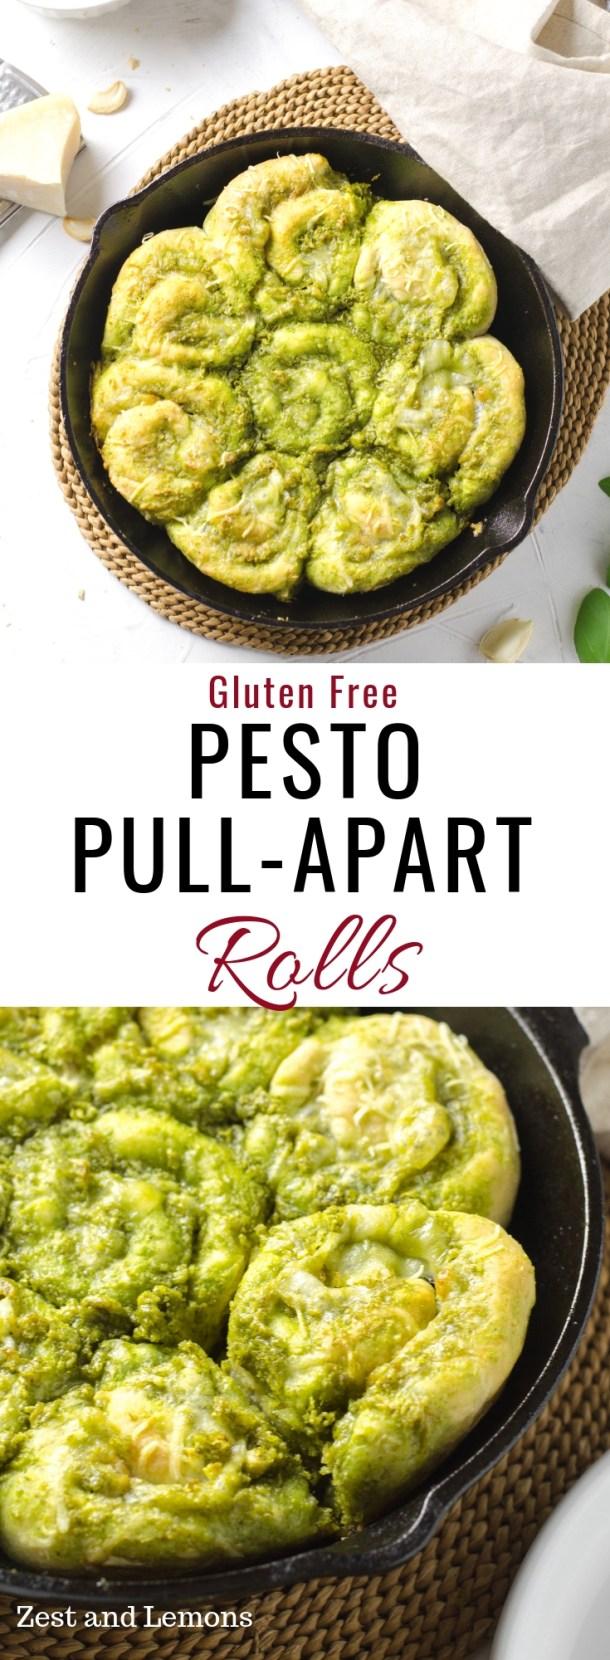 Gluten free pesto pull-apart rolls. Made with a creamy homemade pesto sauce - Zest and Lemons #glutenfree #glutenfreerolls